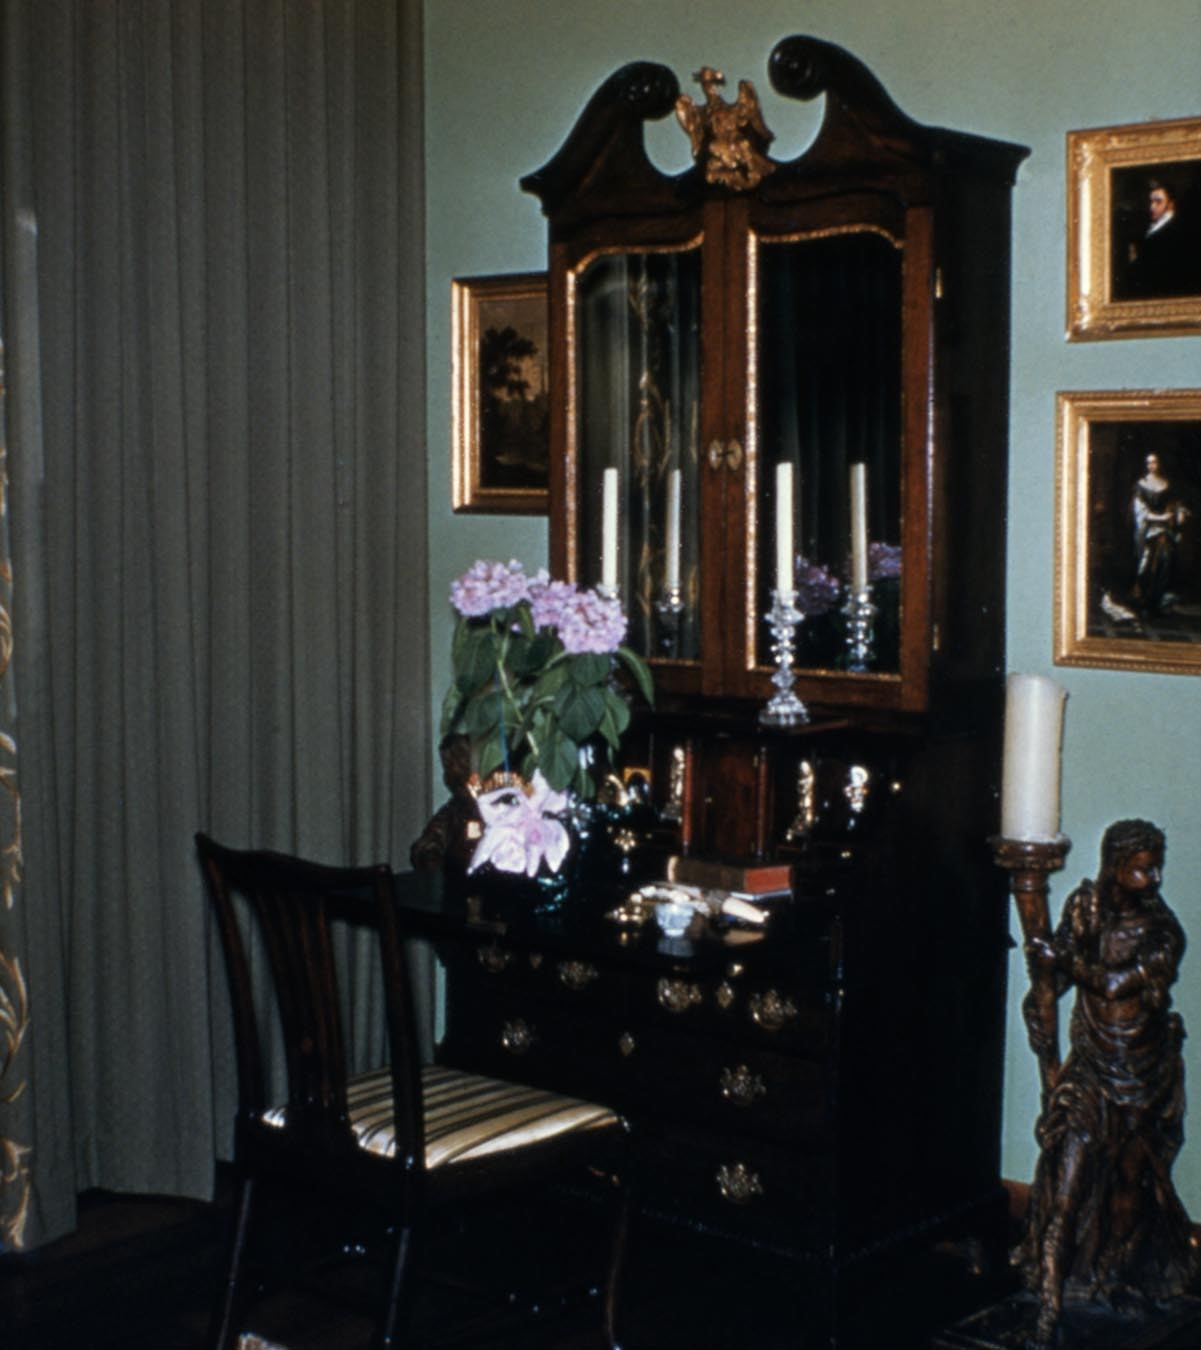 Exhibitions at Rienzi   The Museum of Fine Arts, Houston